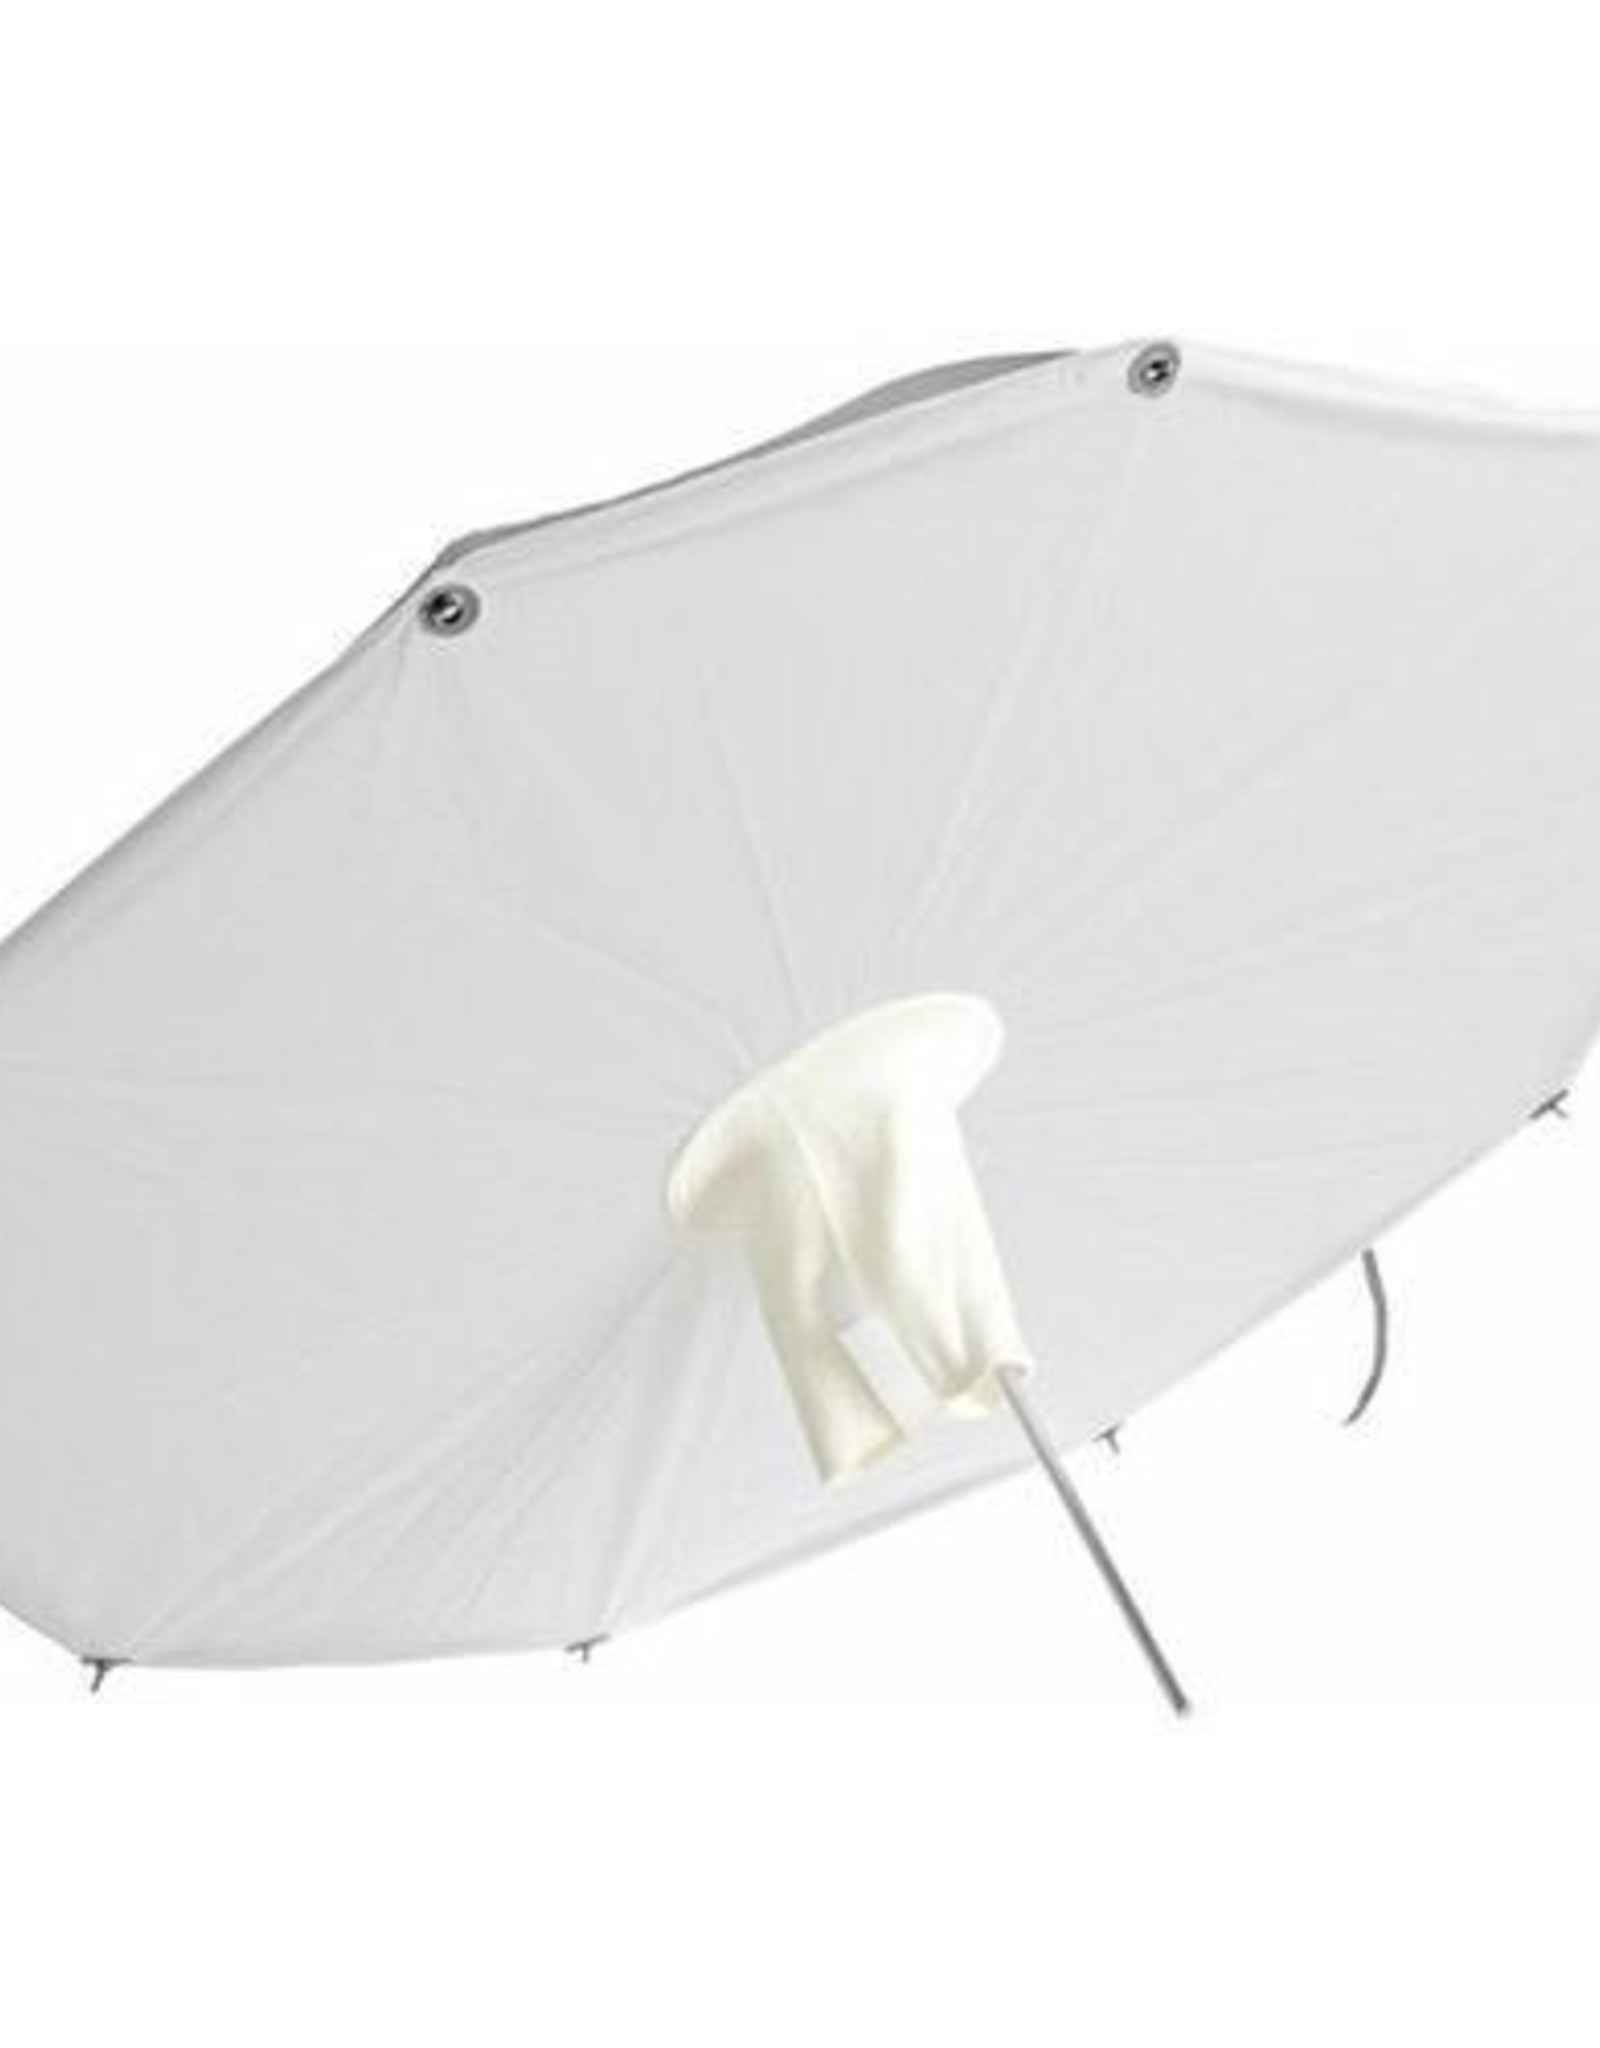 "Photek Photek Umbrella - SoftLighter II with 7mm & 8mm Shafts - 46"""